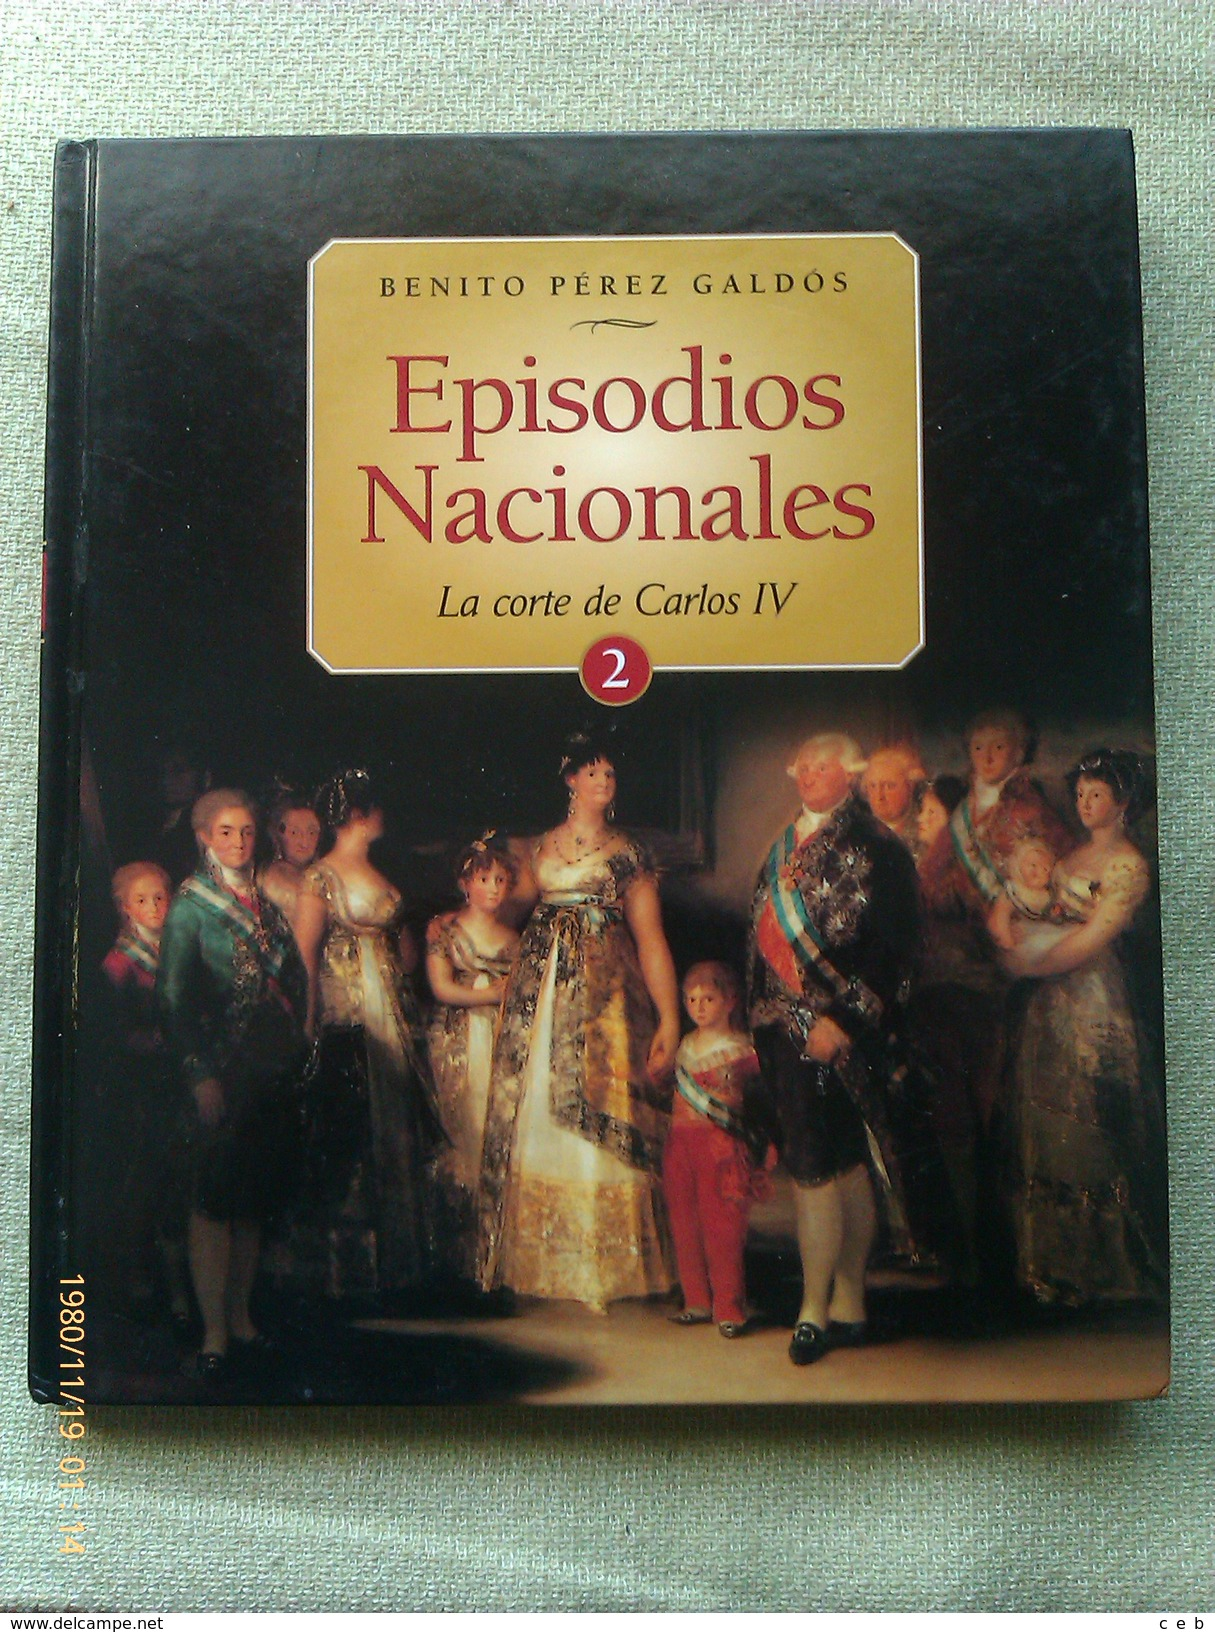 Libro: Episodios Nacionales Nº 2. La Corte De Carlos IV. Benito Pérez Galdos. 2003. España - Libros